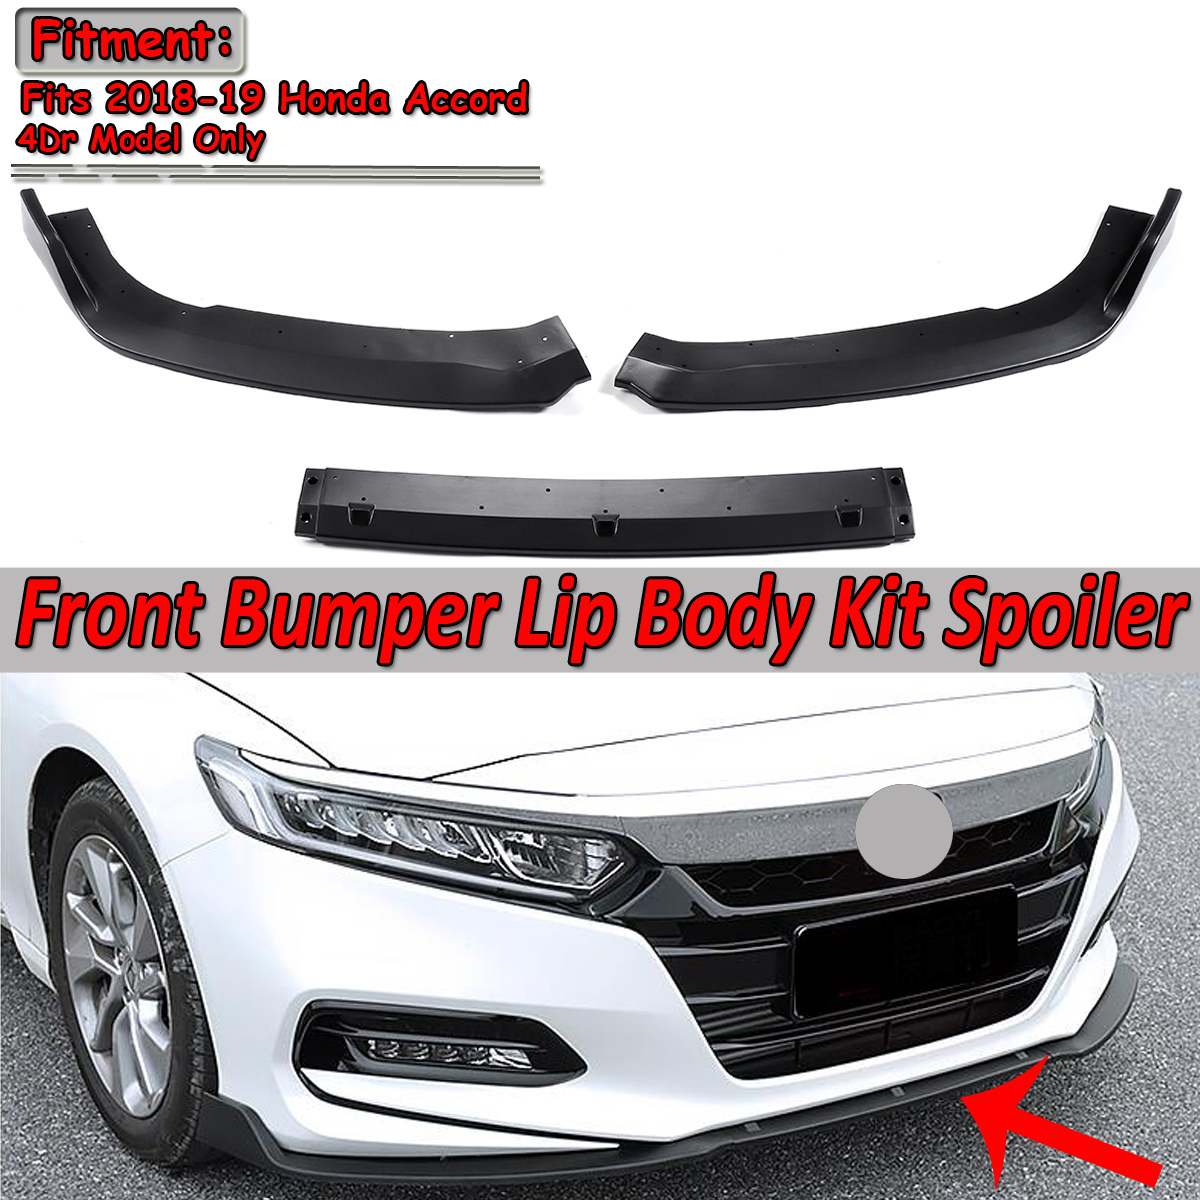 2019 Honda Civic Sedan Front Splitter: Aliexpress.com : Buy New 3pcs Designed Car Front Bumper